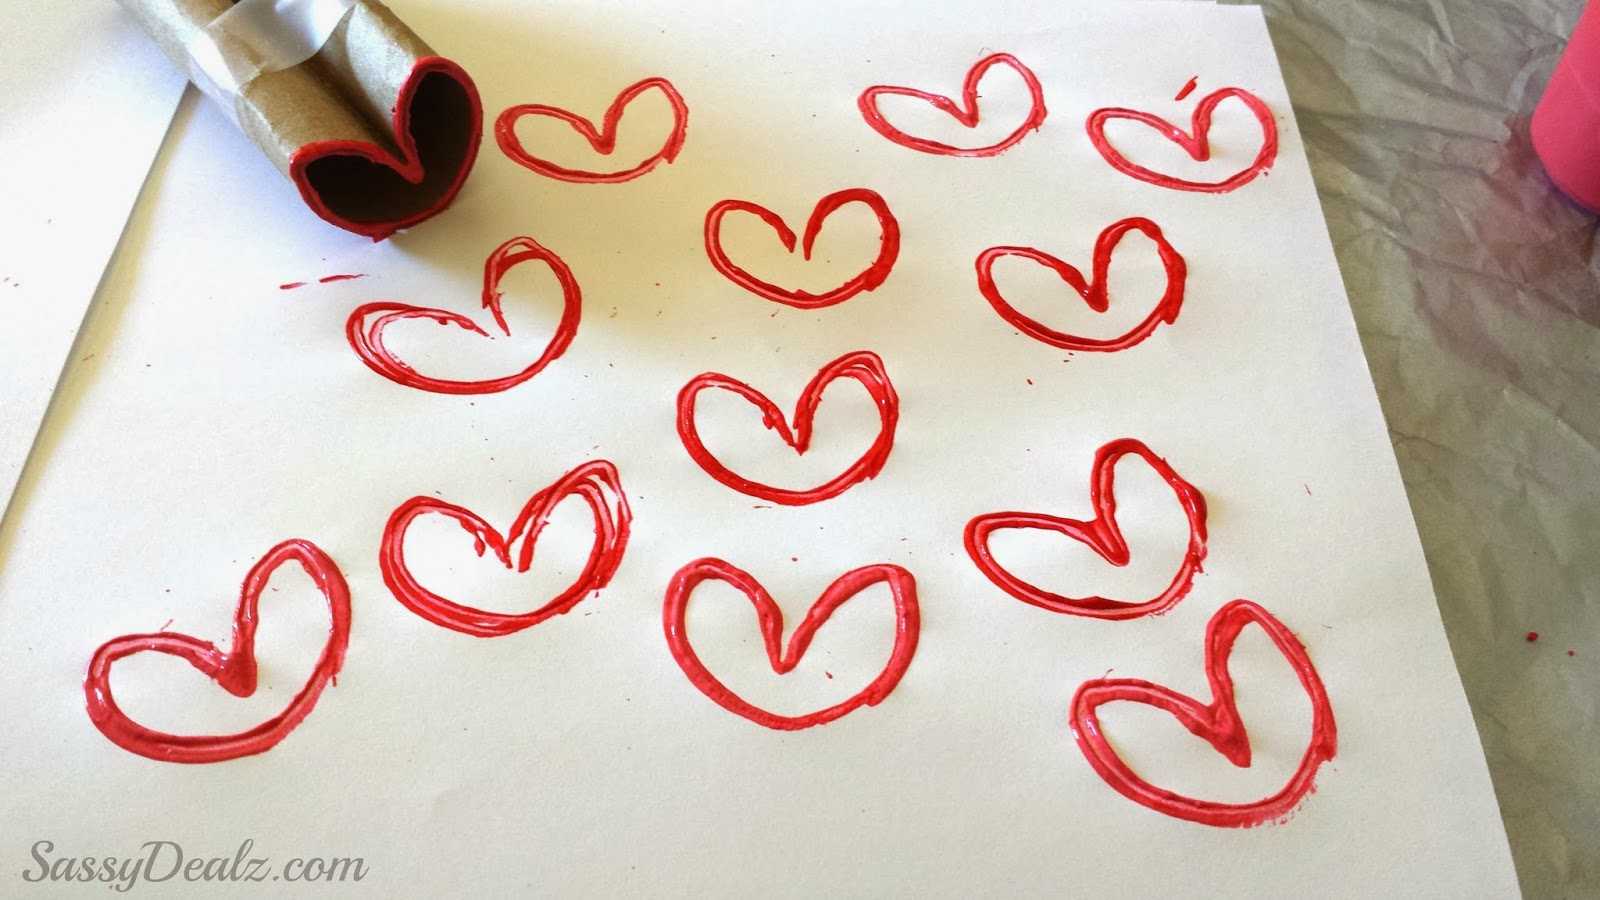 Diy heart stamp using toilet paper rolls kids valentines craft valentines heart stamp toilet paper roll jeuxipadfo Gallery